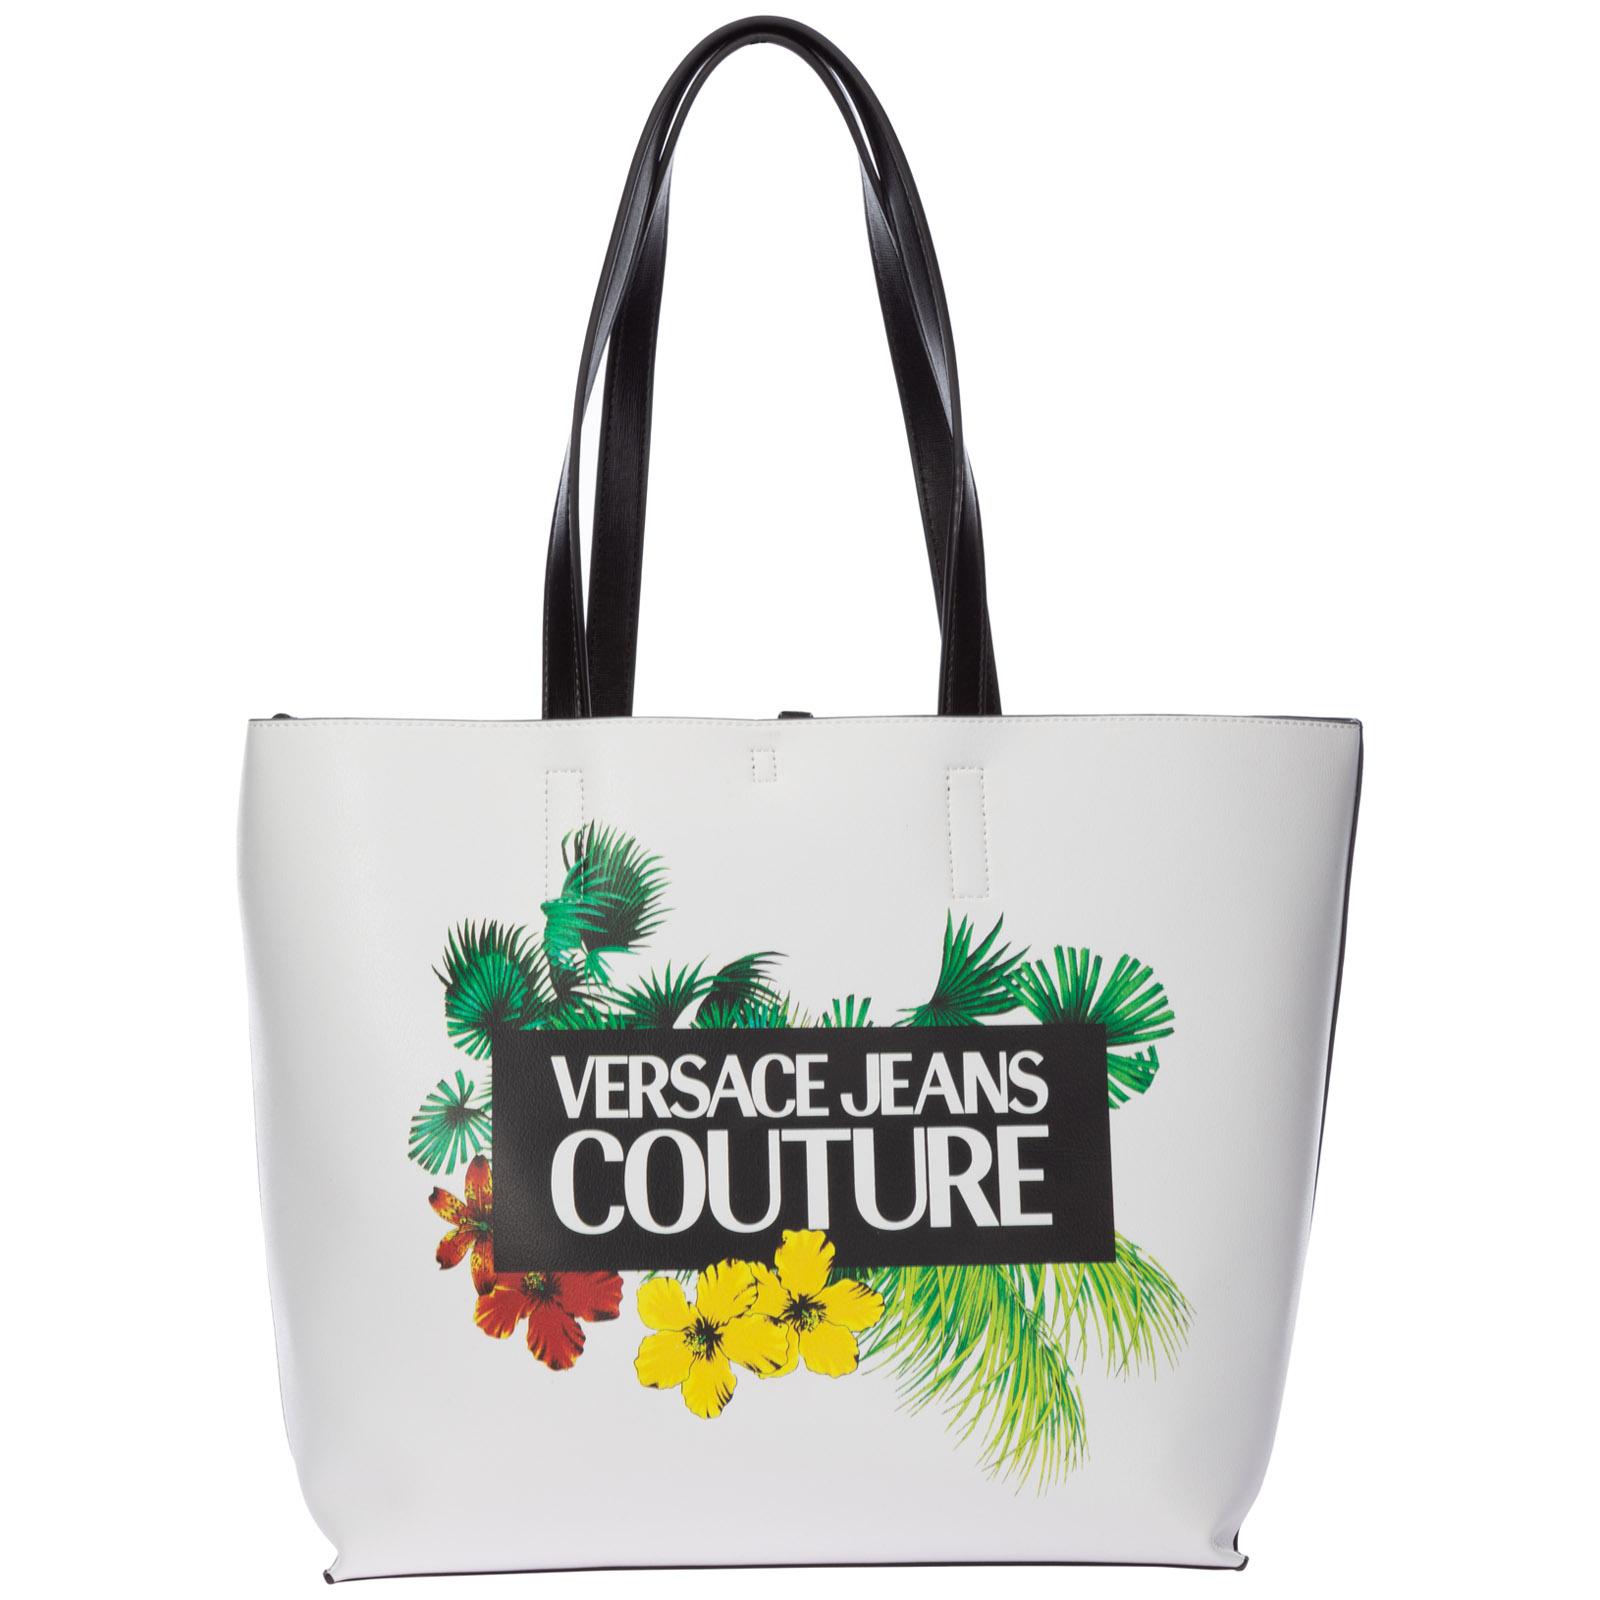 Versace Jeans Women/'s Shopping Bag Grey